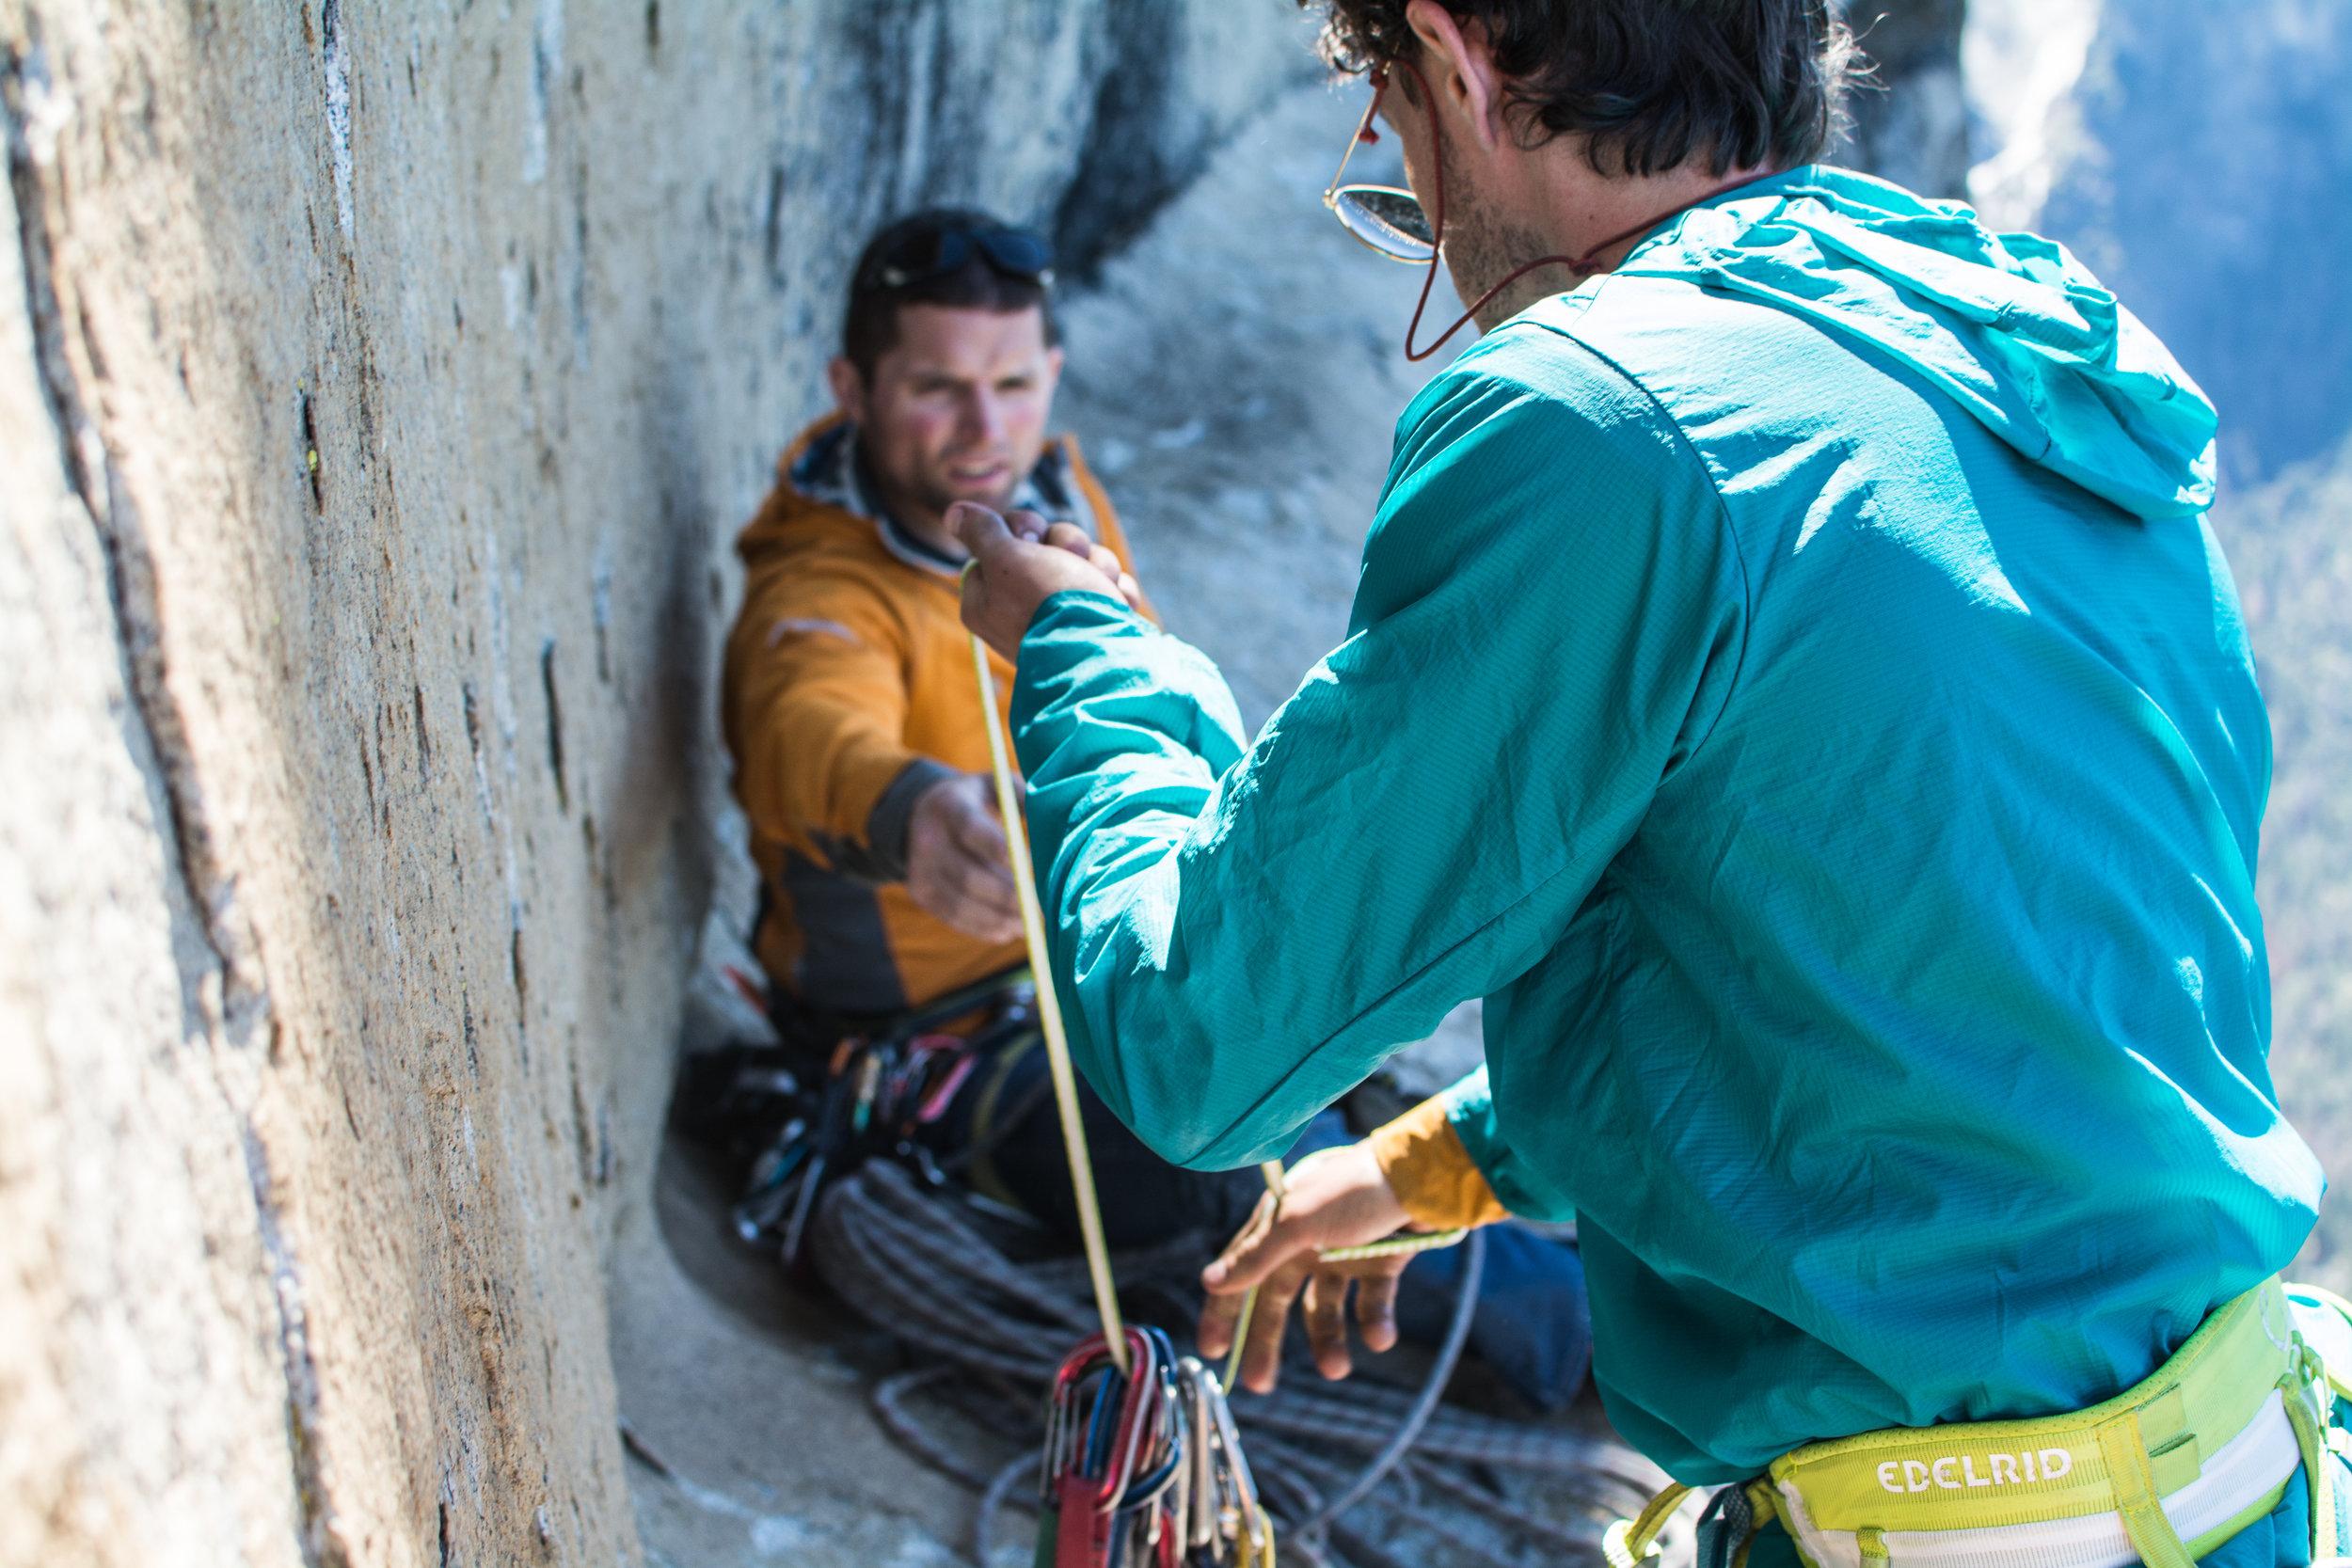 Sorting gear high on El Capitan